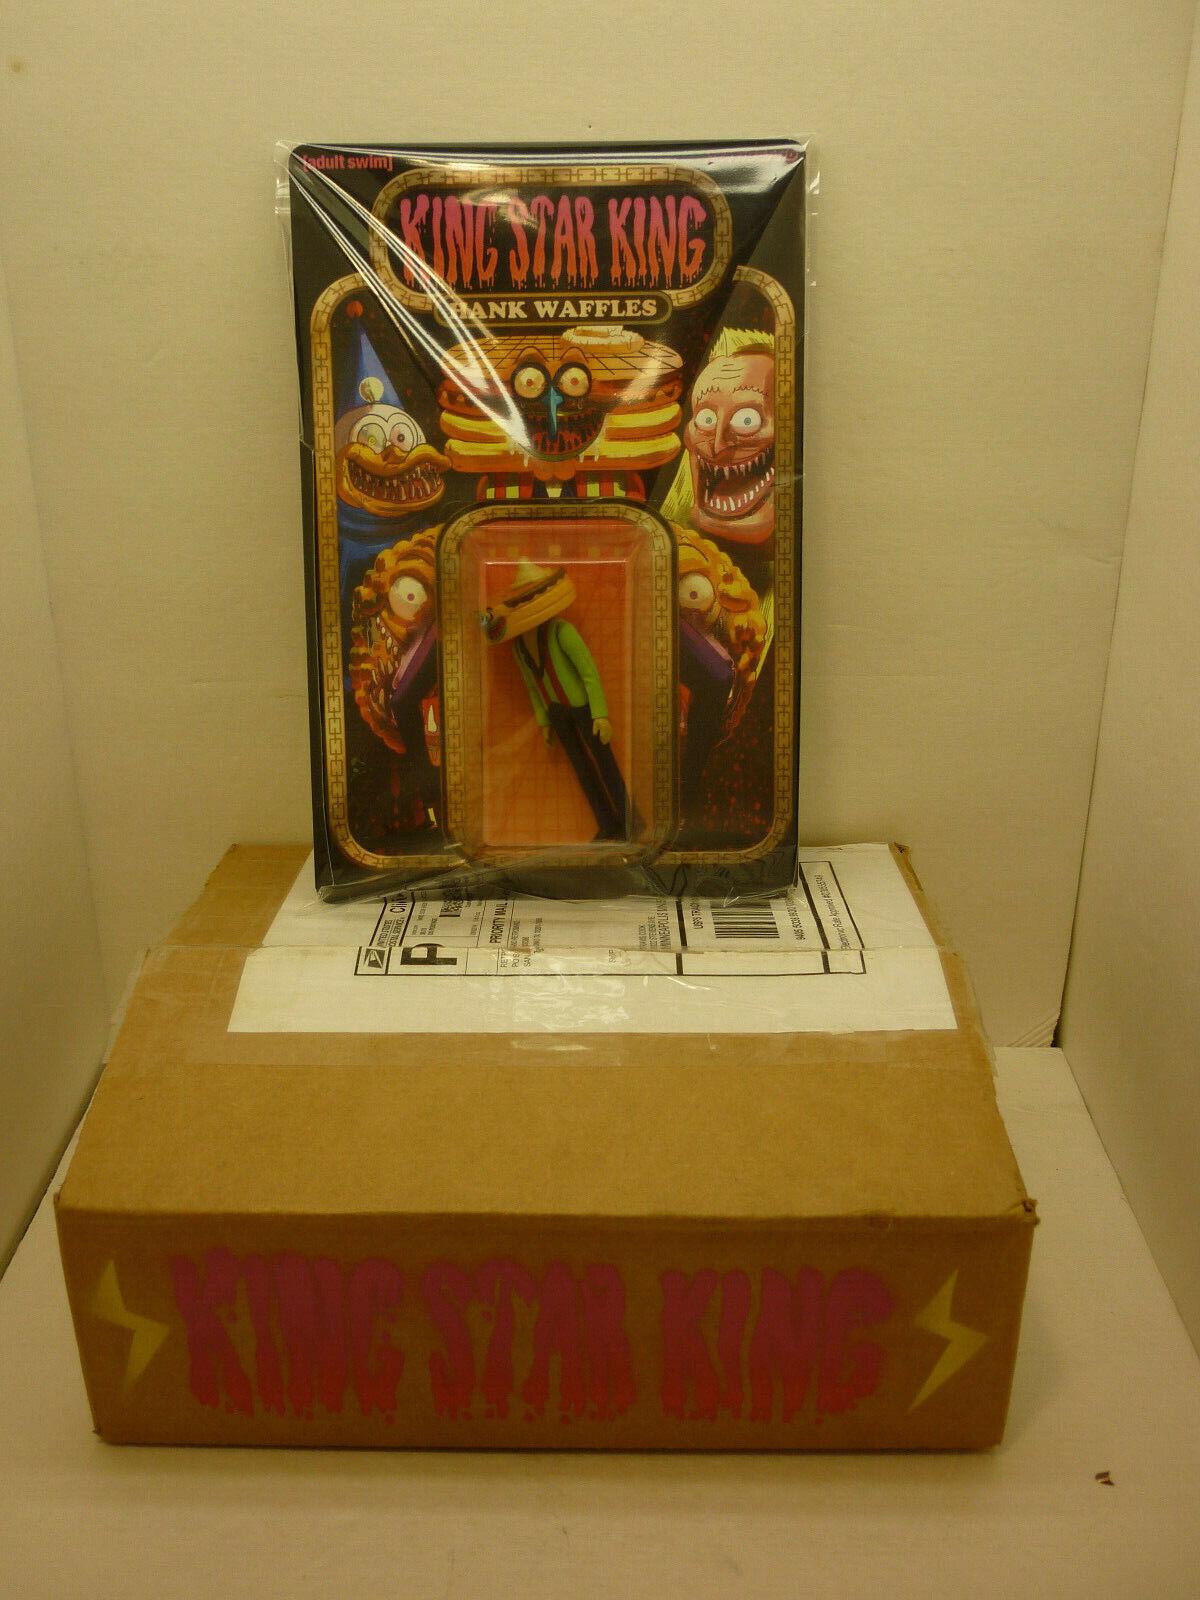 Retroband KING KING KING STAR KING Hank Waffles Action Figure Adult Swim DCON ORIGINAL BOX aeeb6c